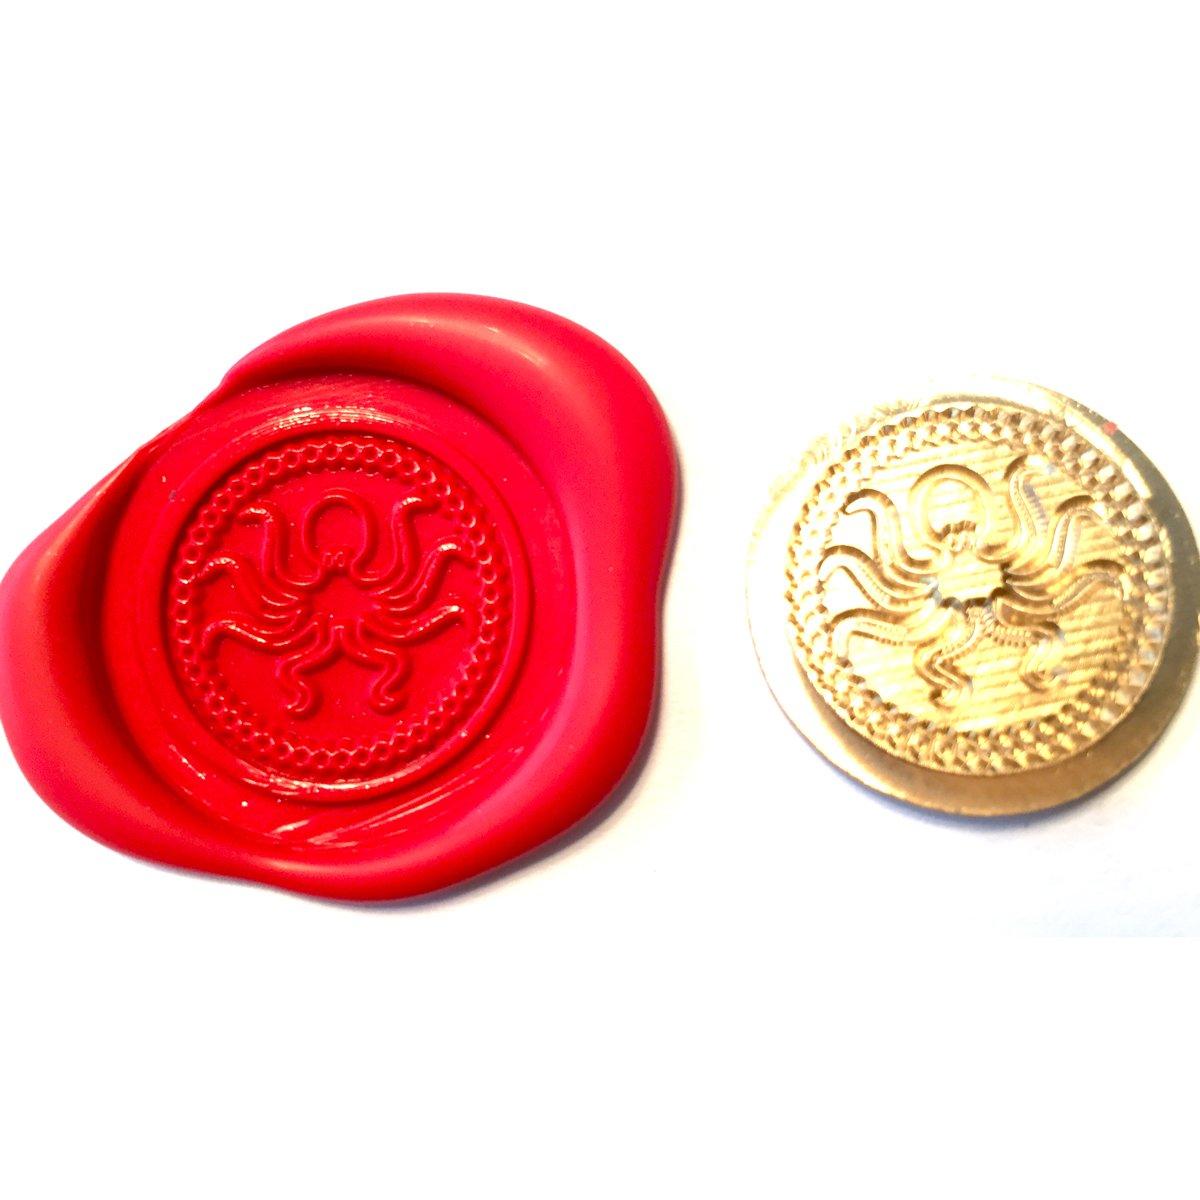 A Single OCTOPUS Coin Seal XWSC125 (S9) GTR-Gifts